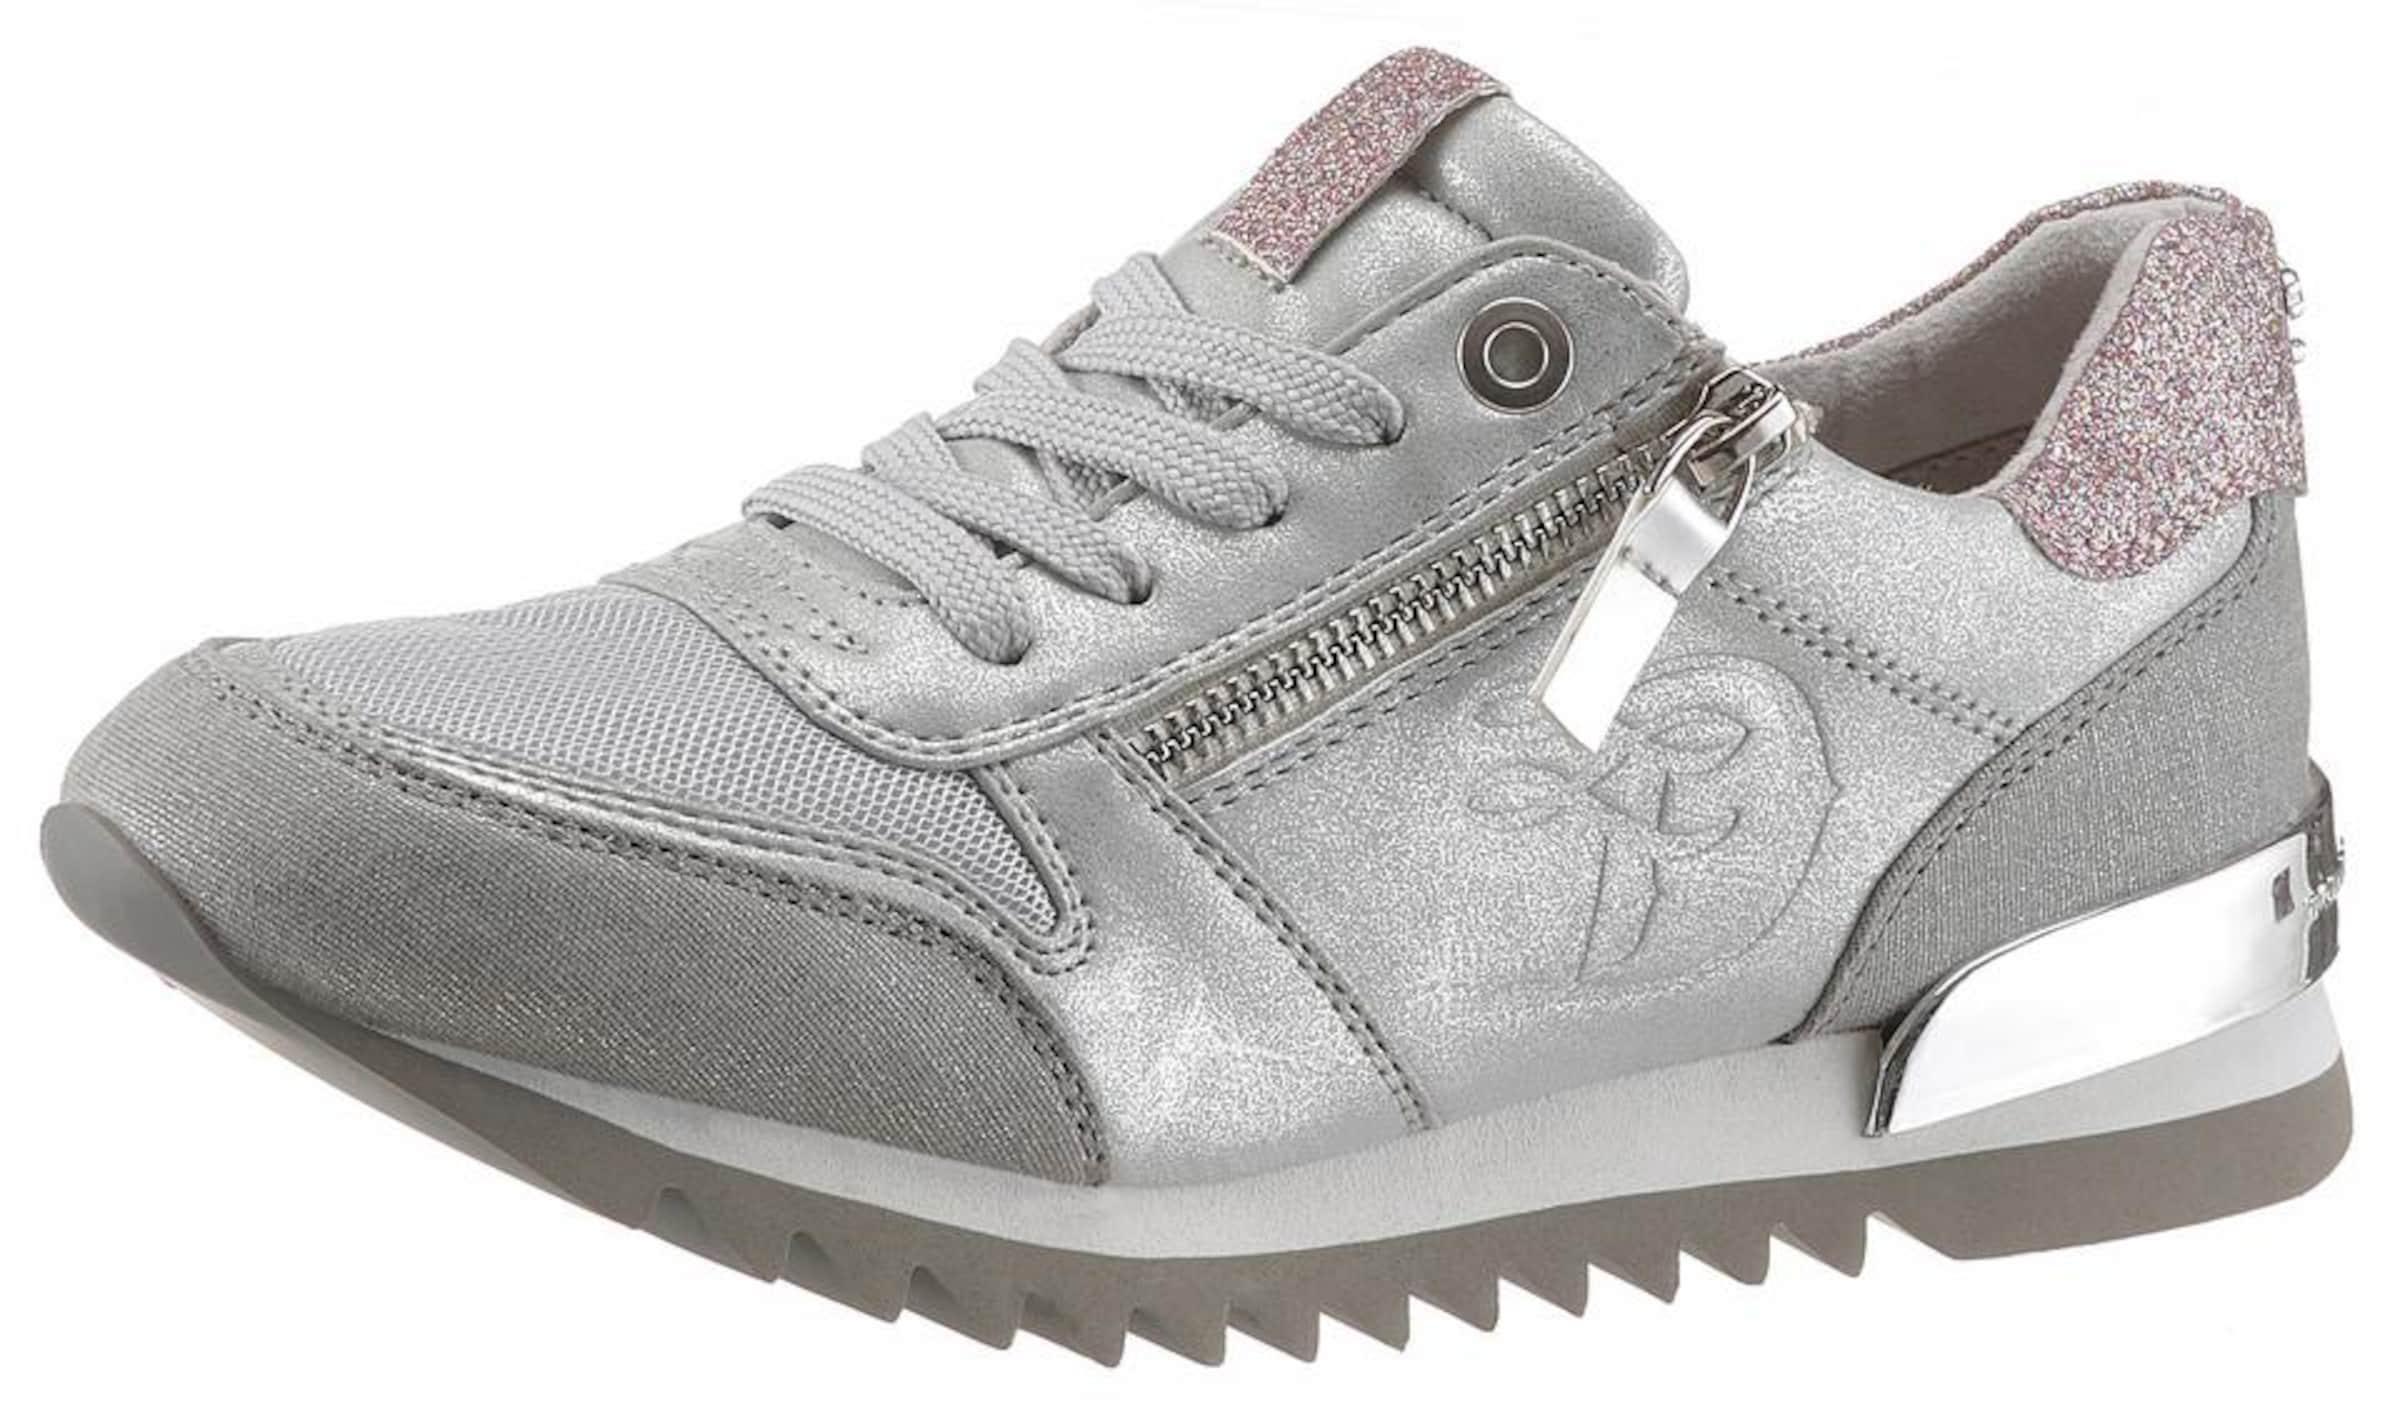 TOM TAILOR Sneaker Günstig Kauft Besten Platz x6lNKzSSb